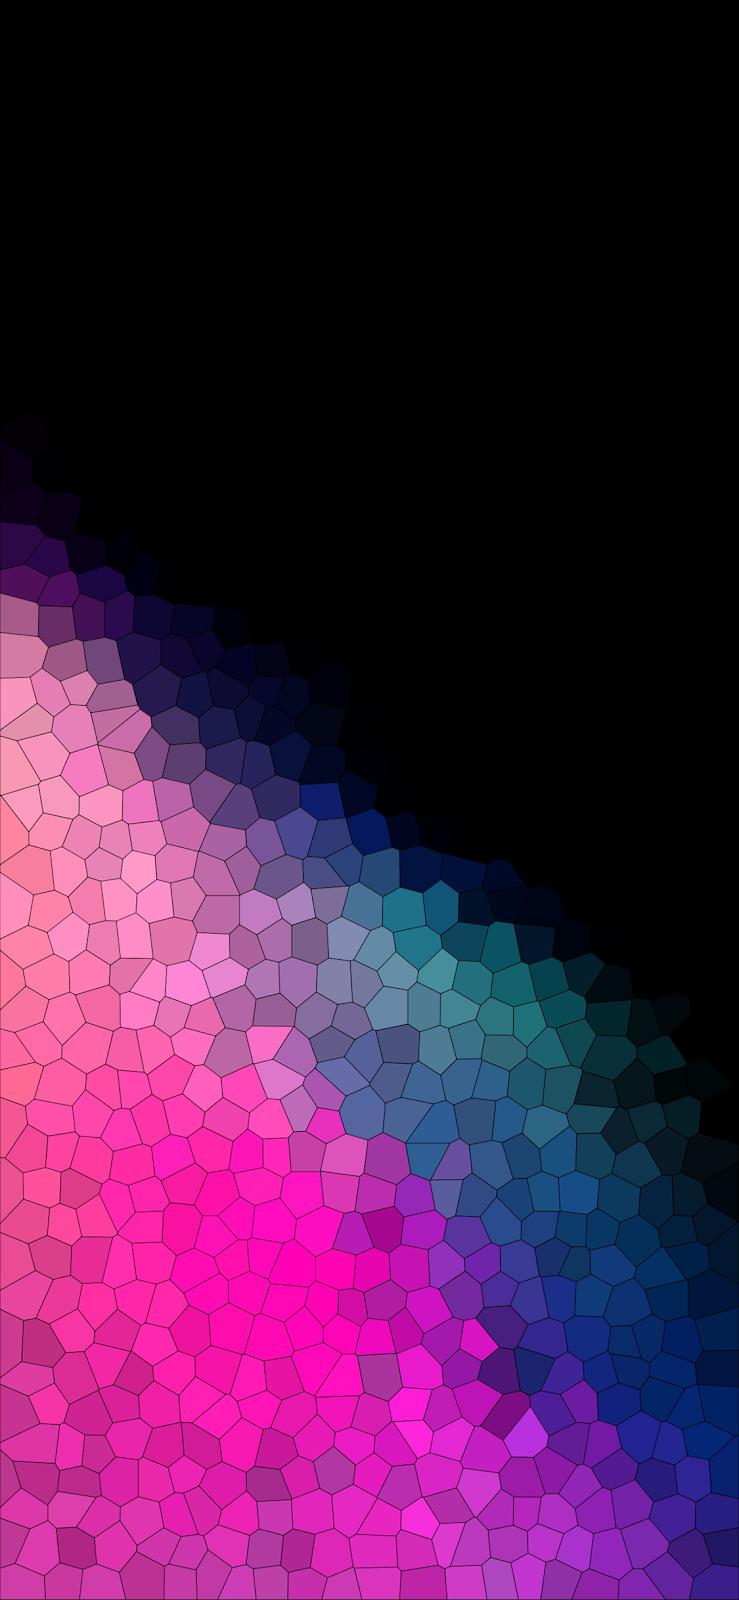 Mosaic (iPhone X)